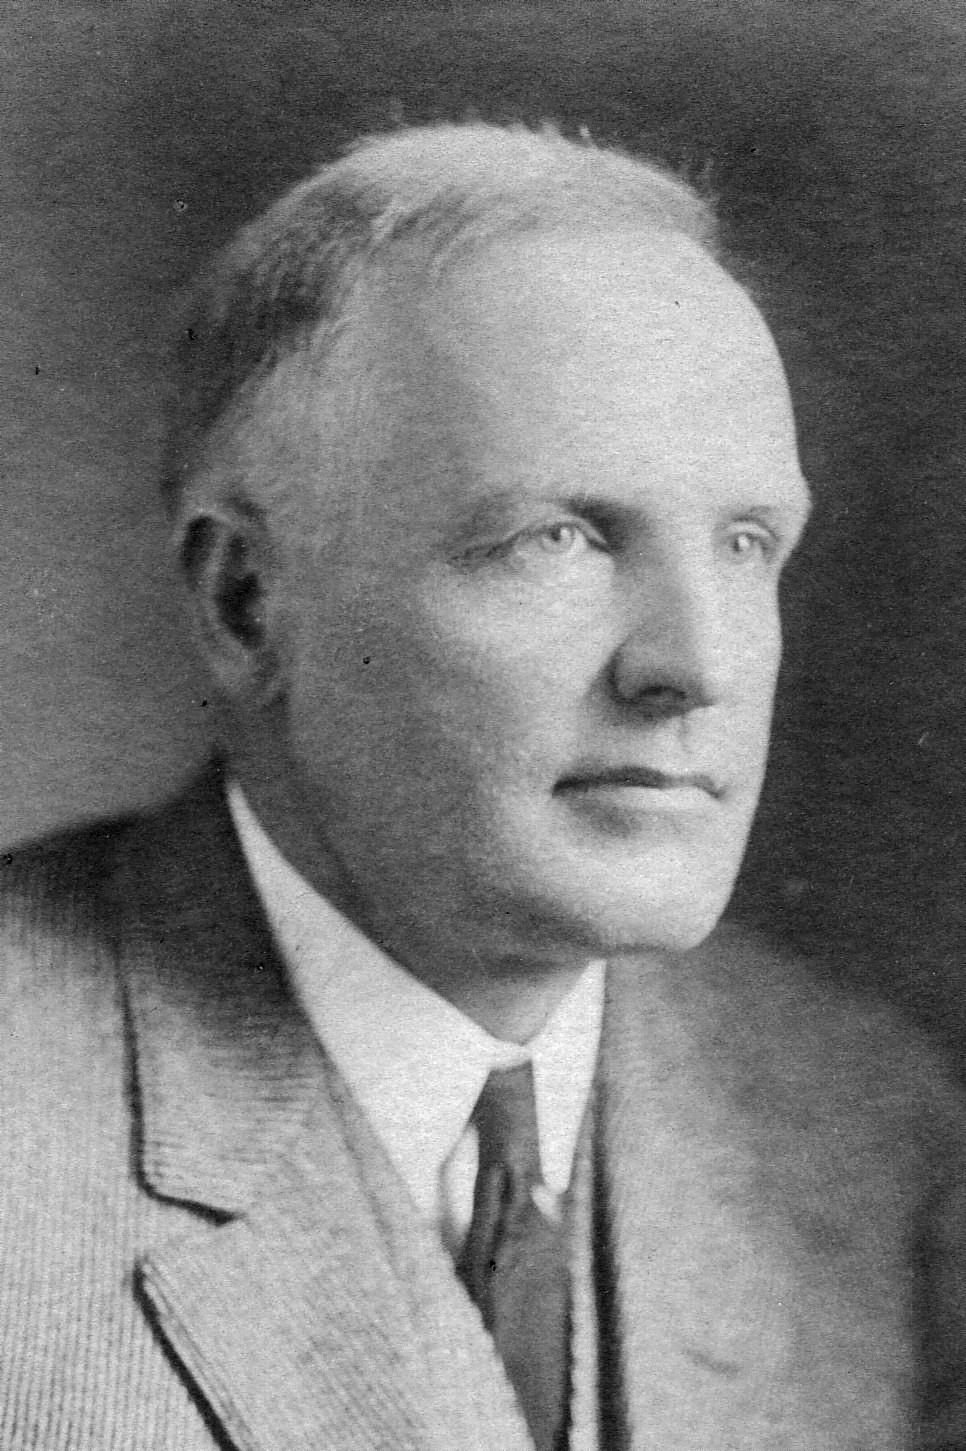 Horace E. Bemis